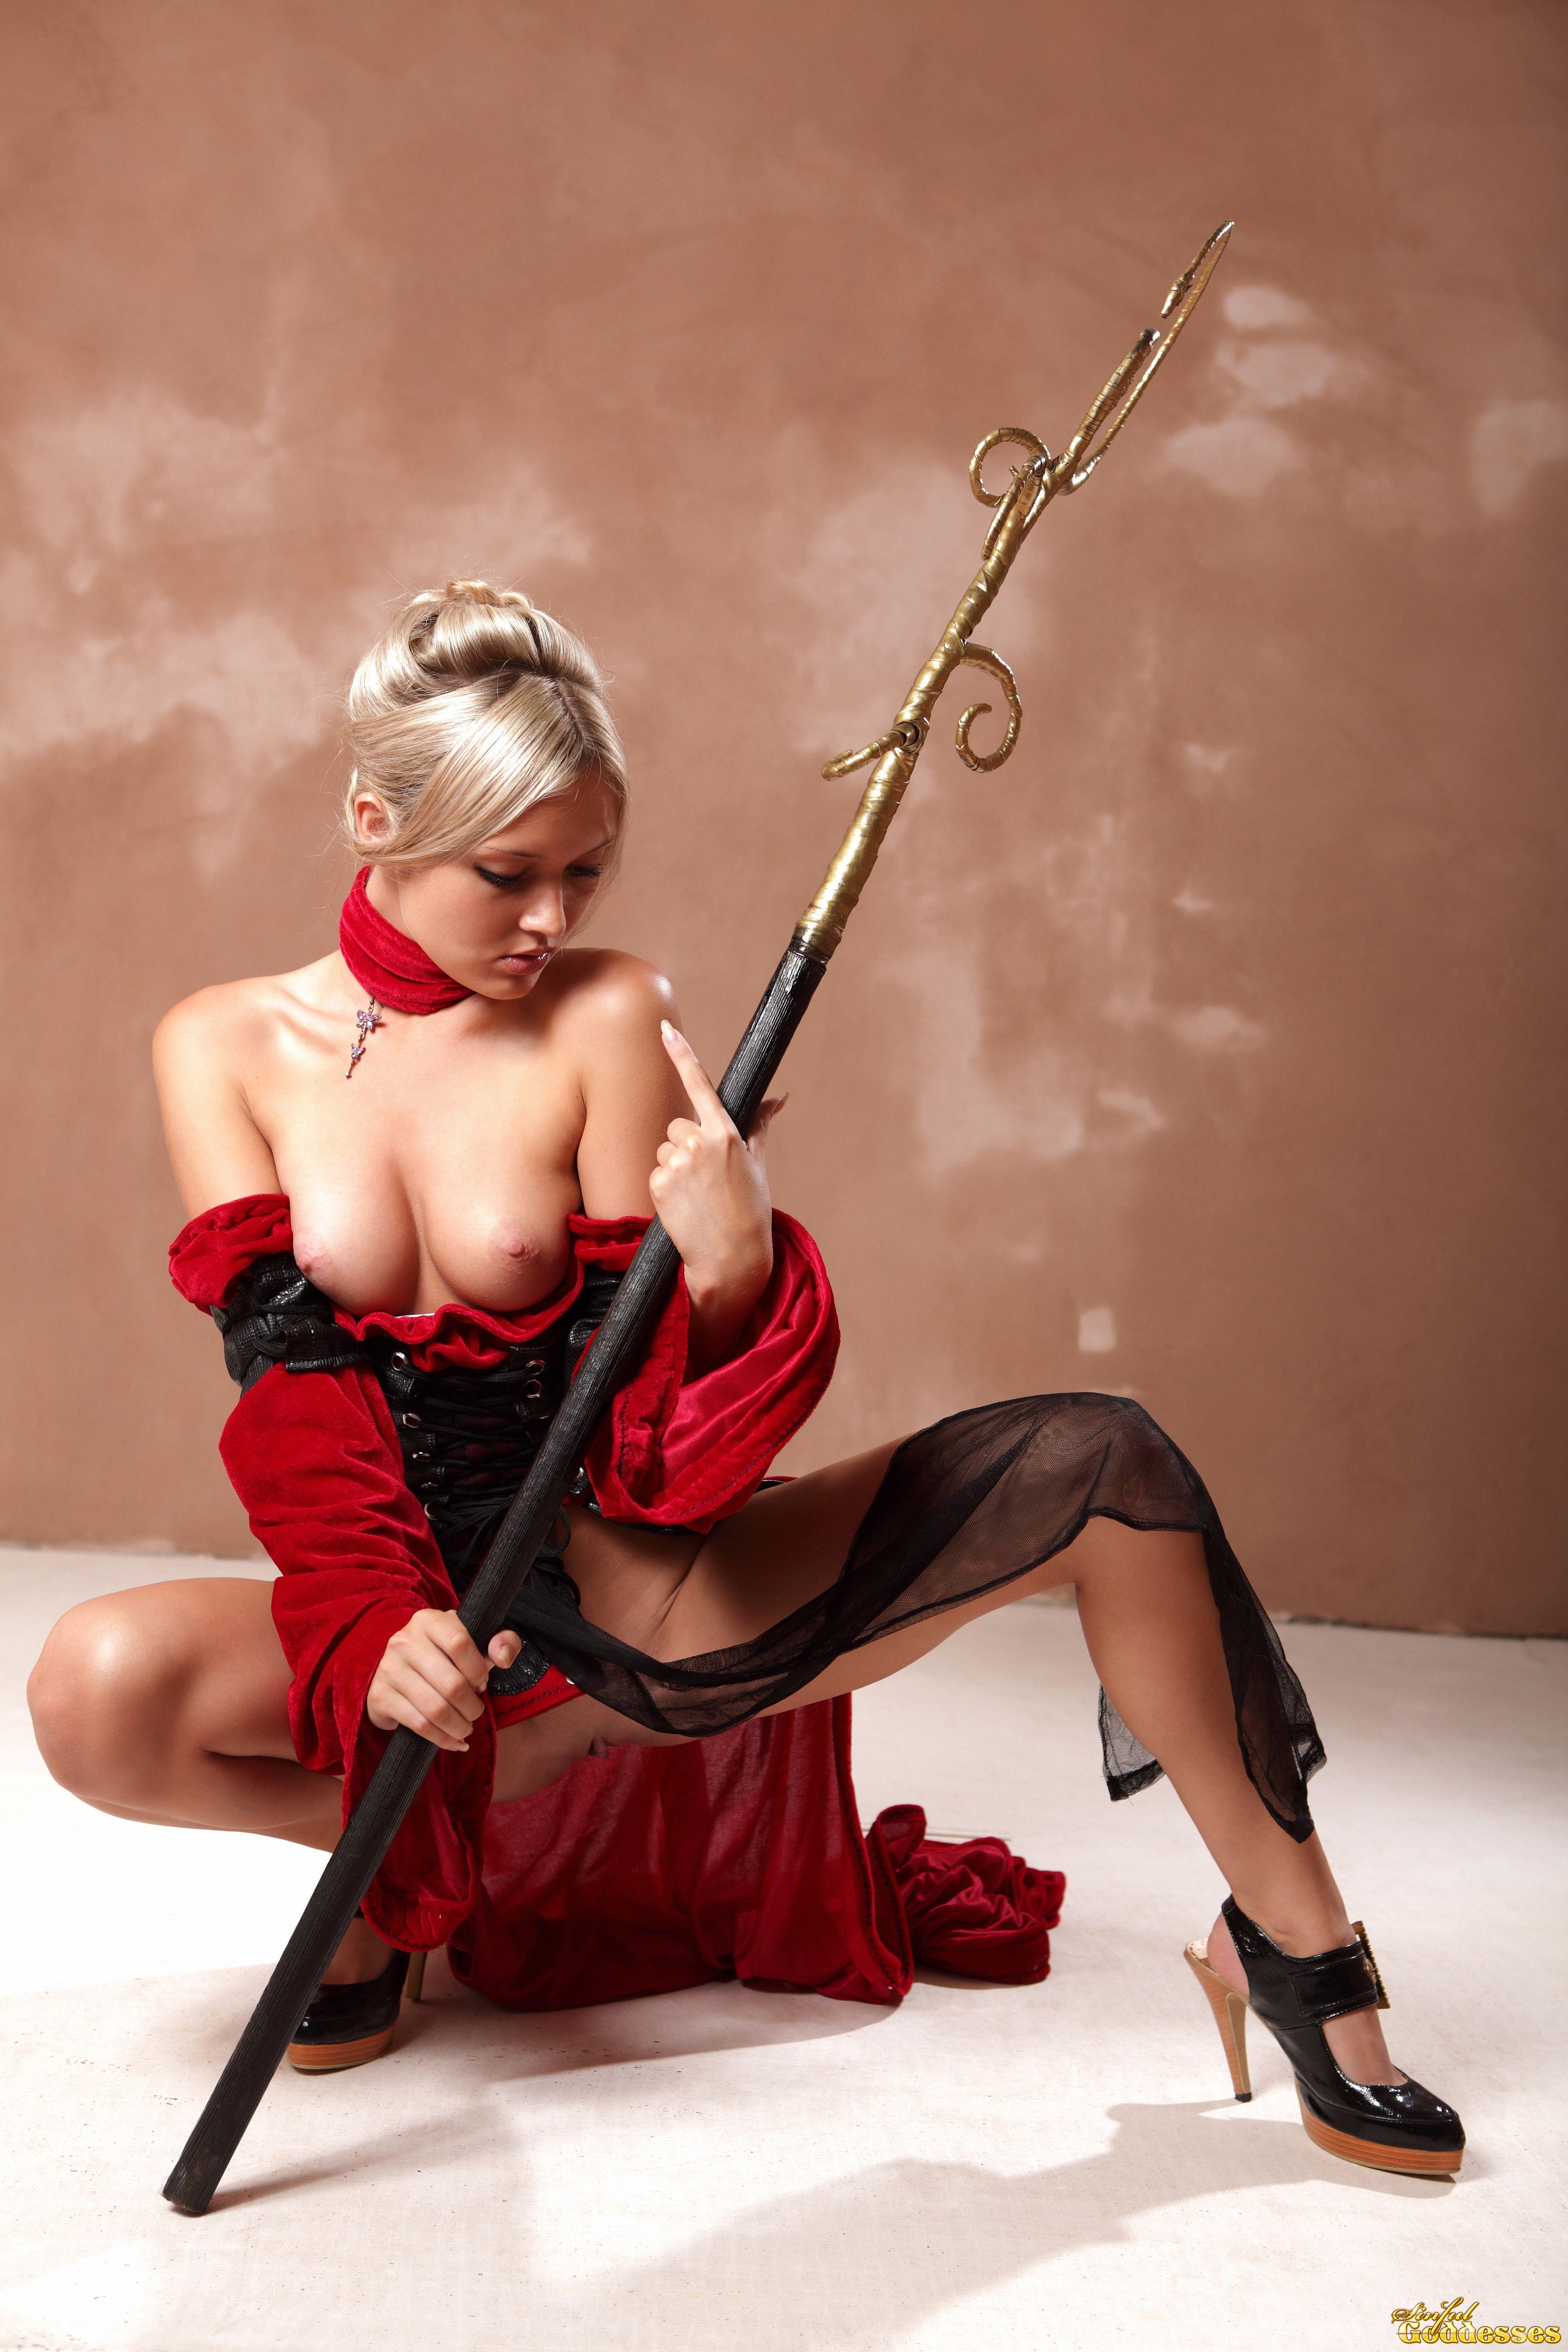 Elves warrior nude sexy model porn images